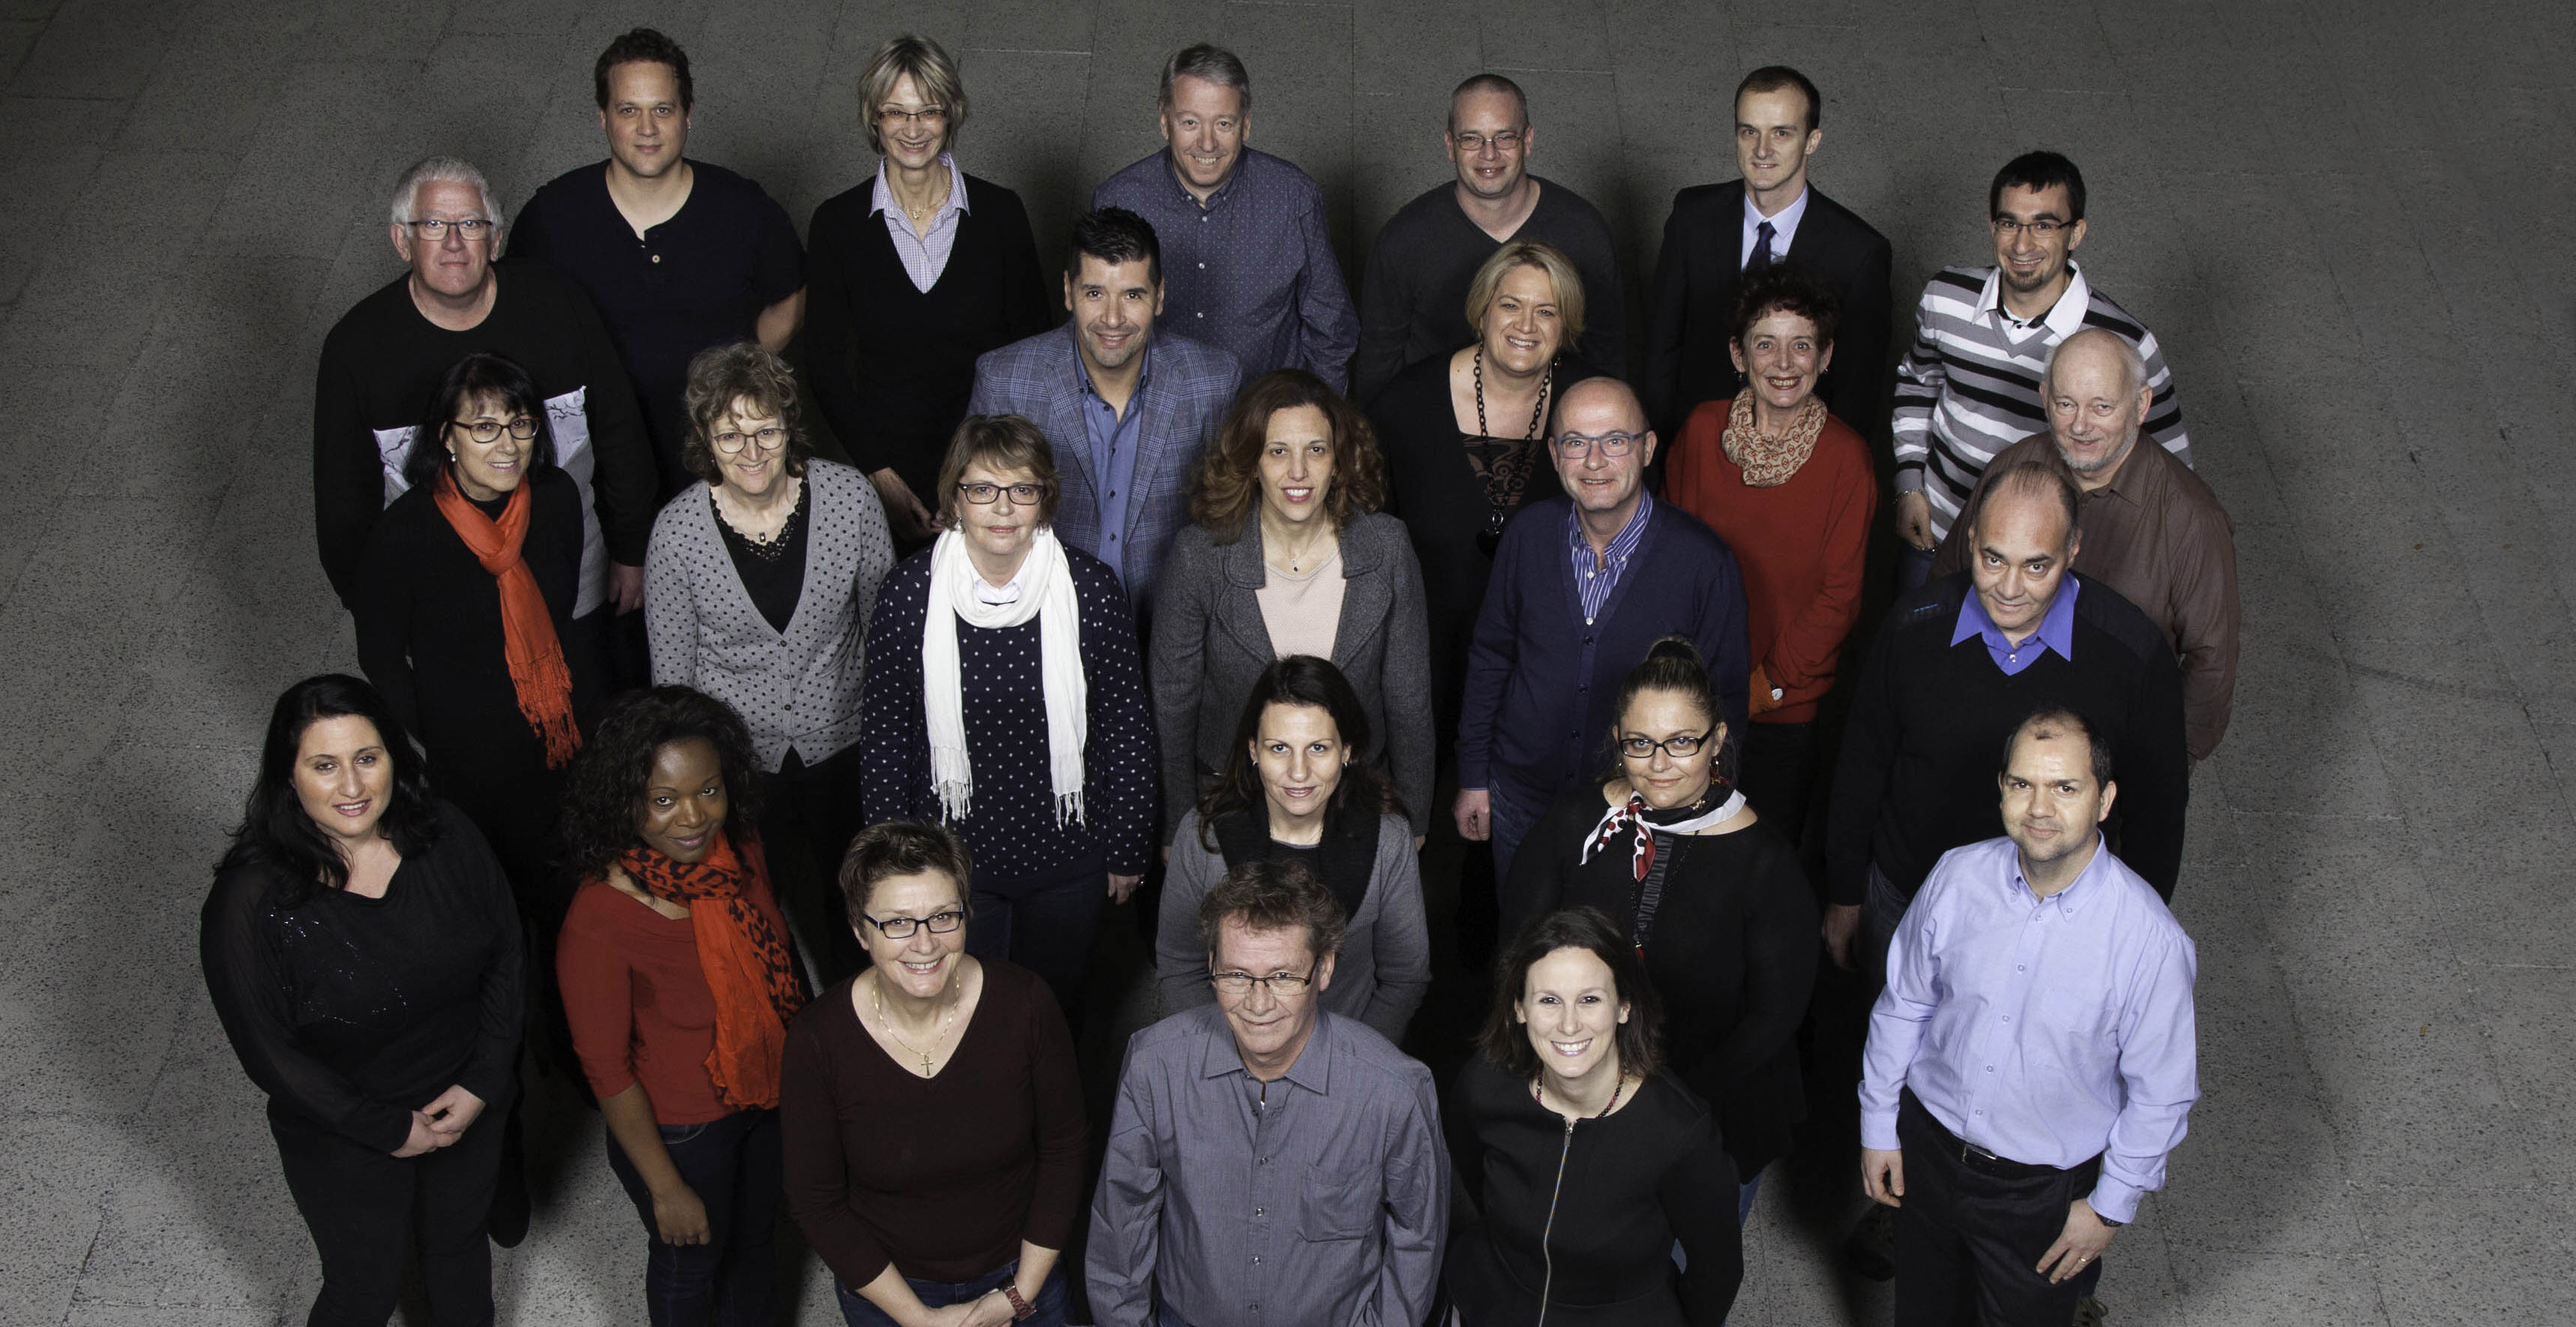 Conseil communal - candidats 2016